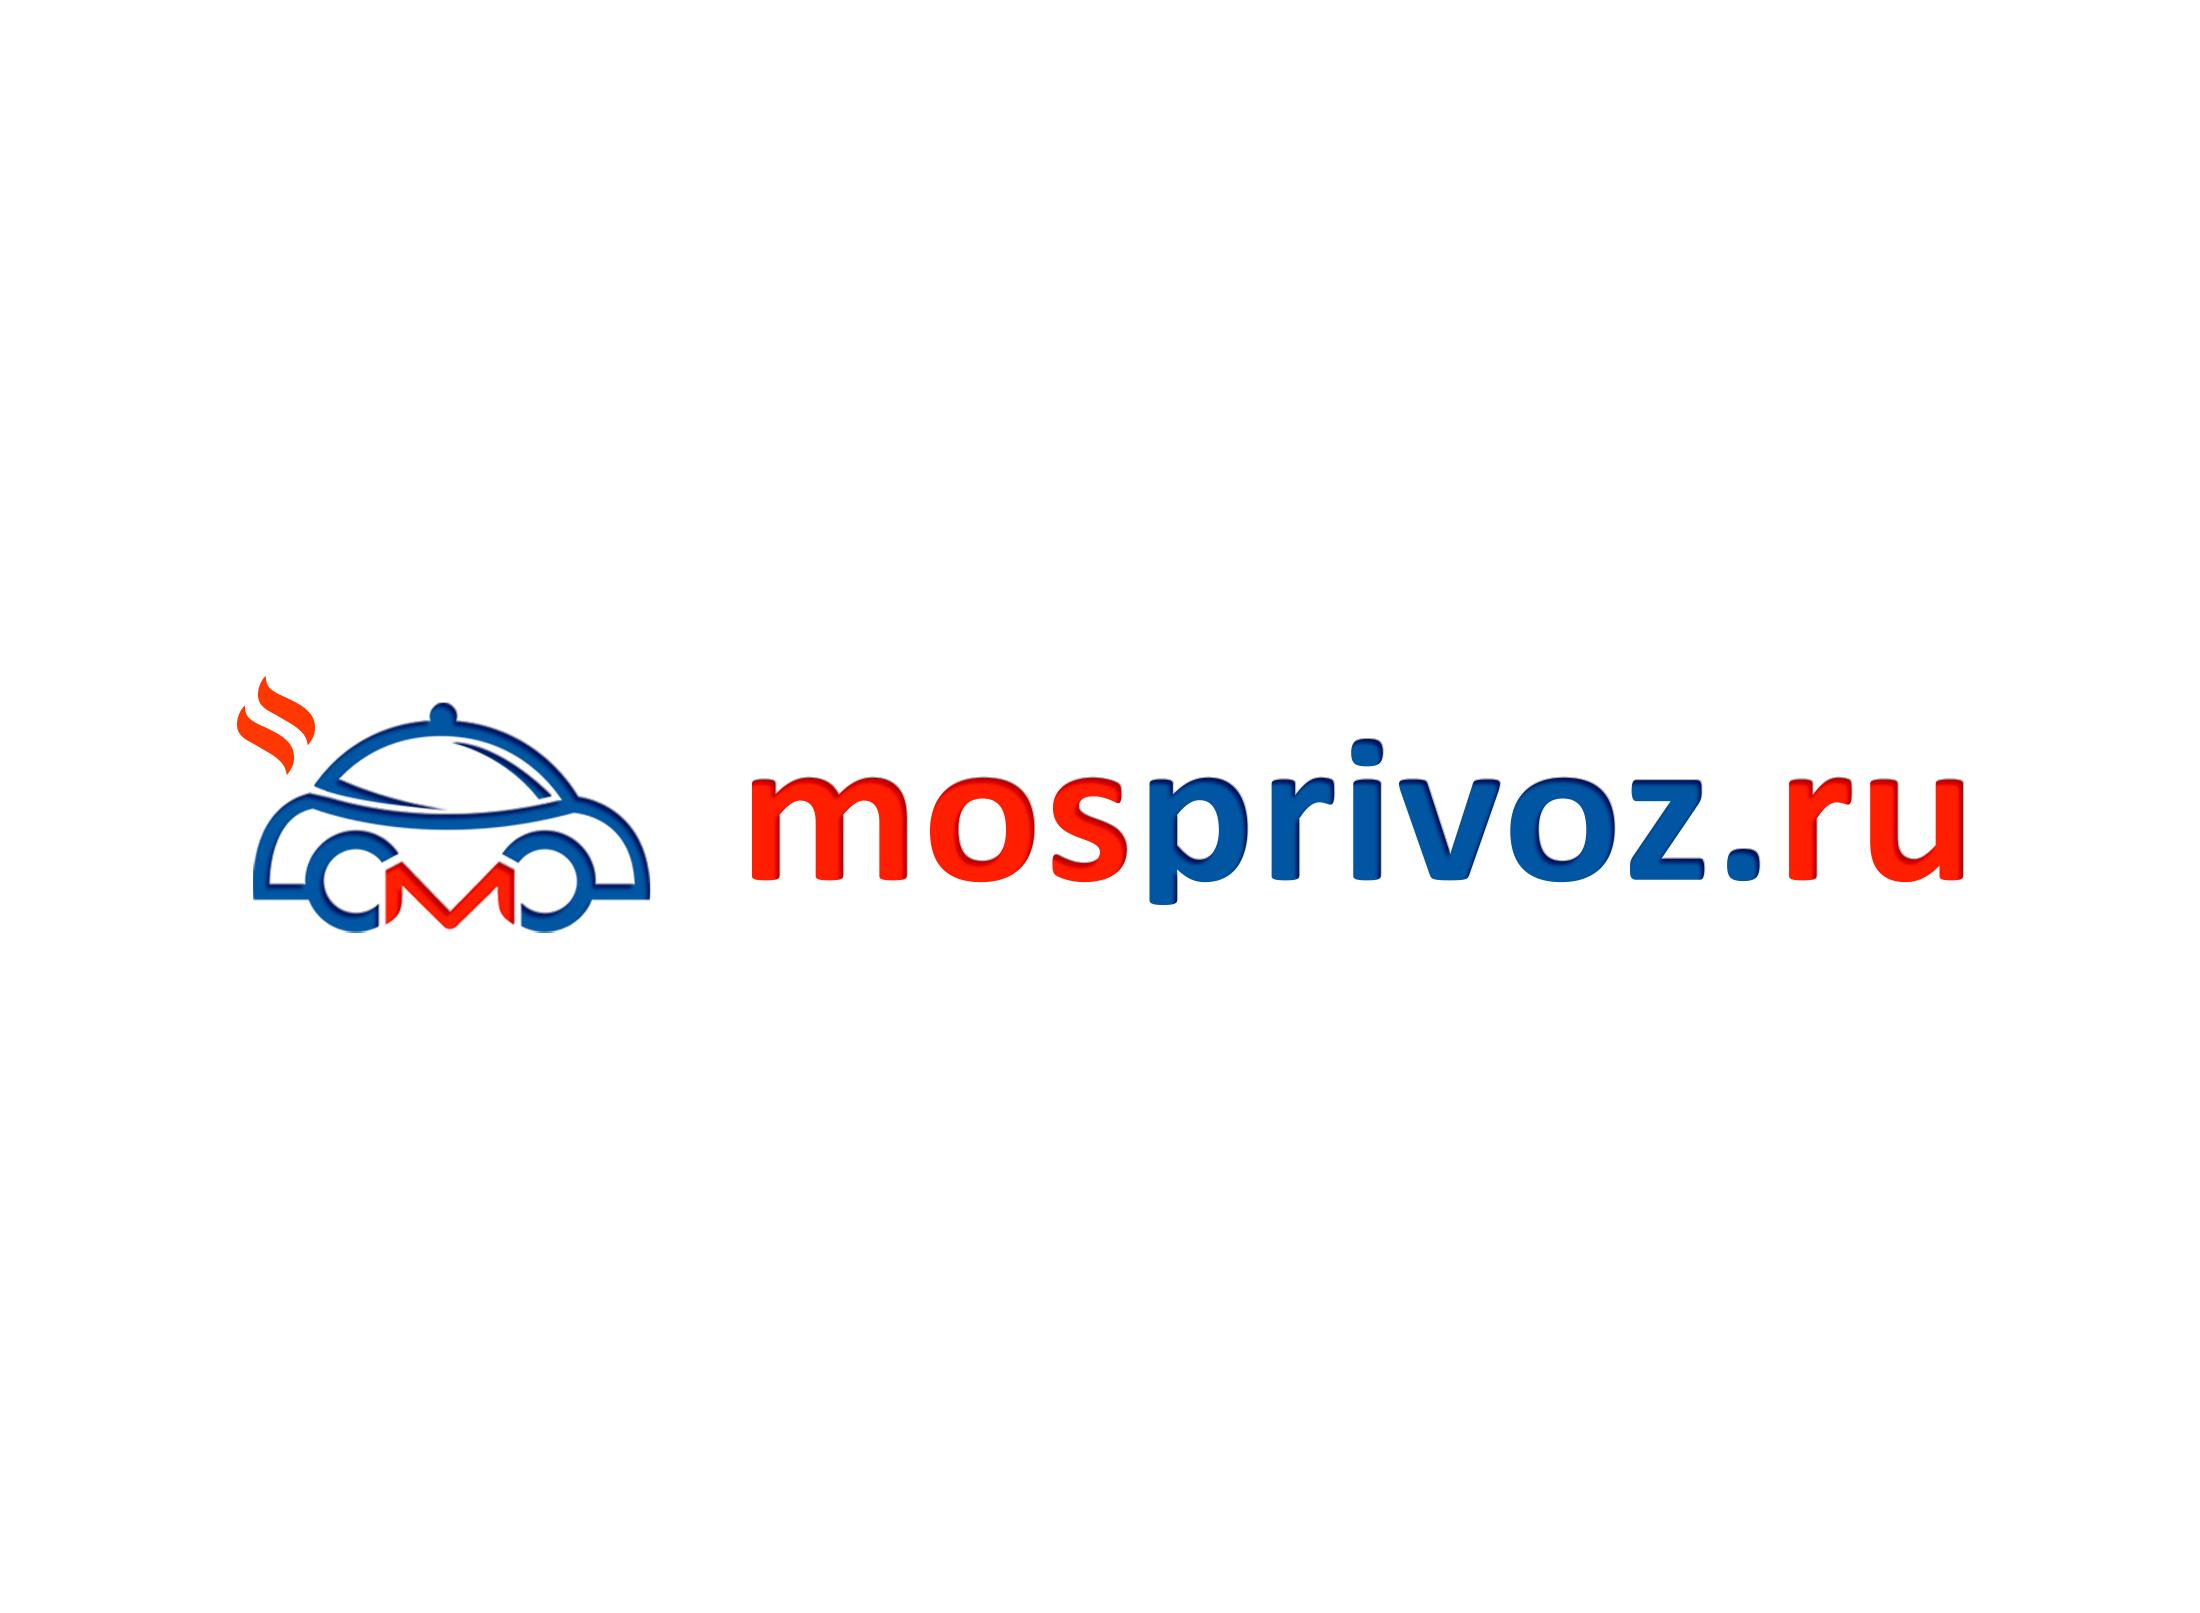 Логотип. Интернет - магазин по доставке продуктов питания. фото f_2525ada539a2ef3f.jpg